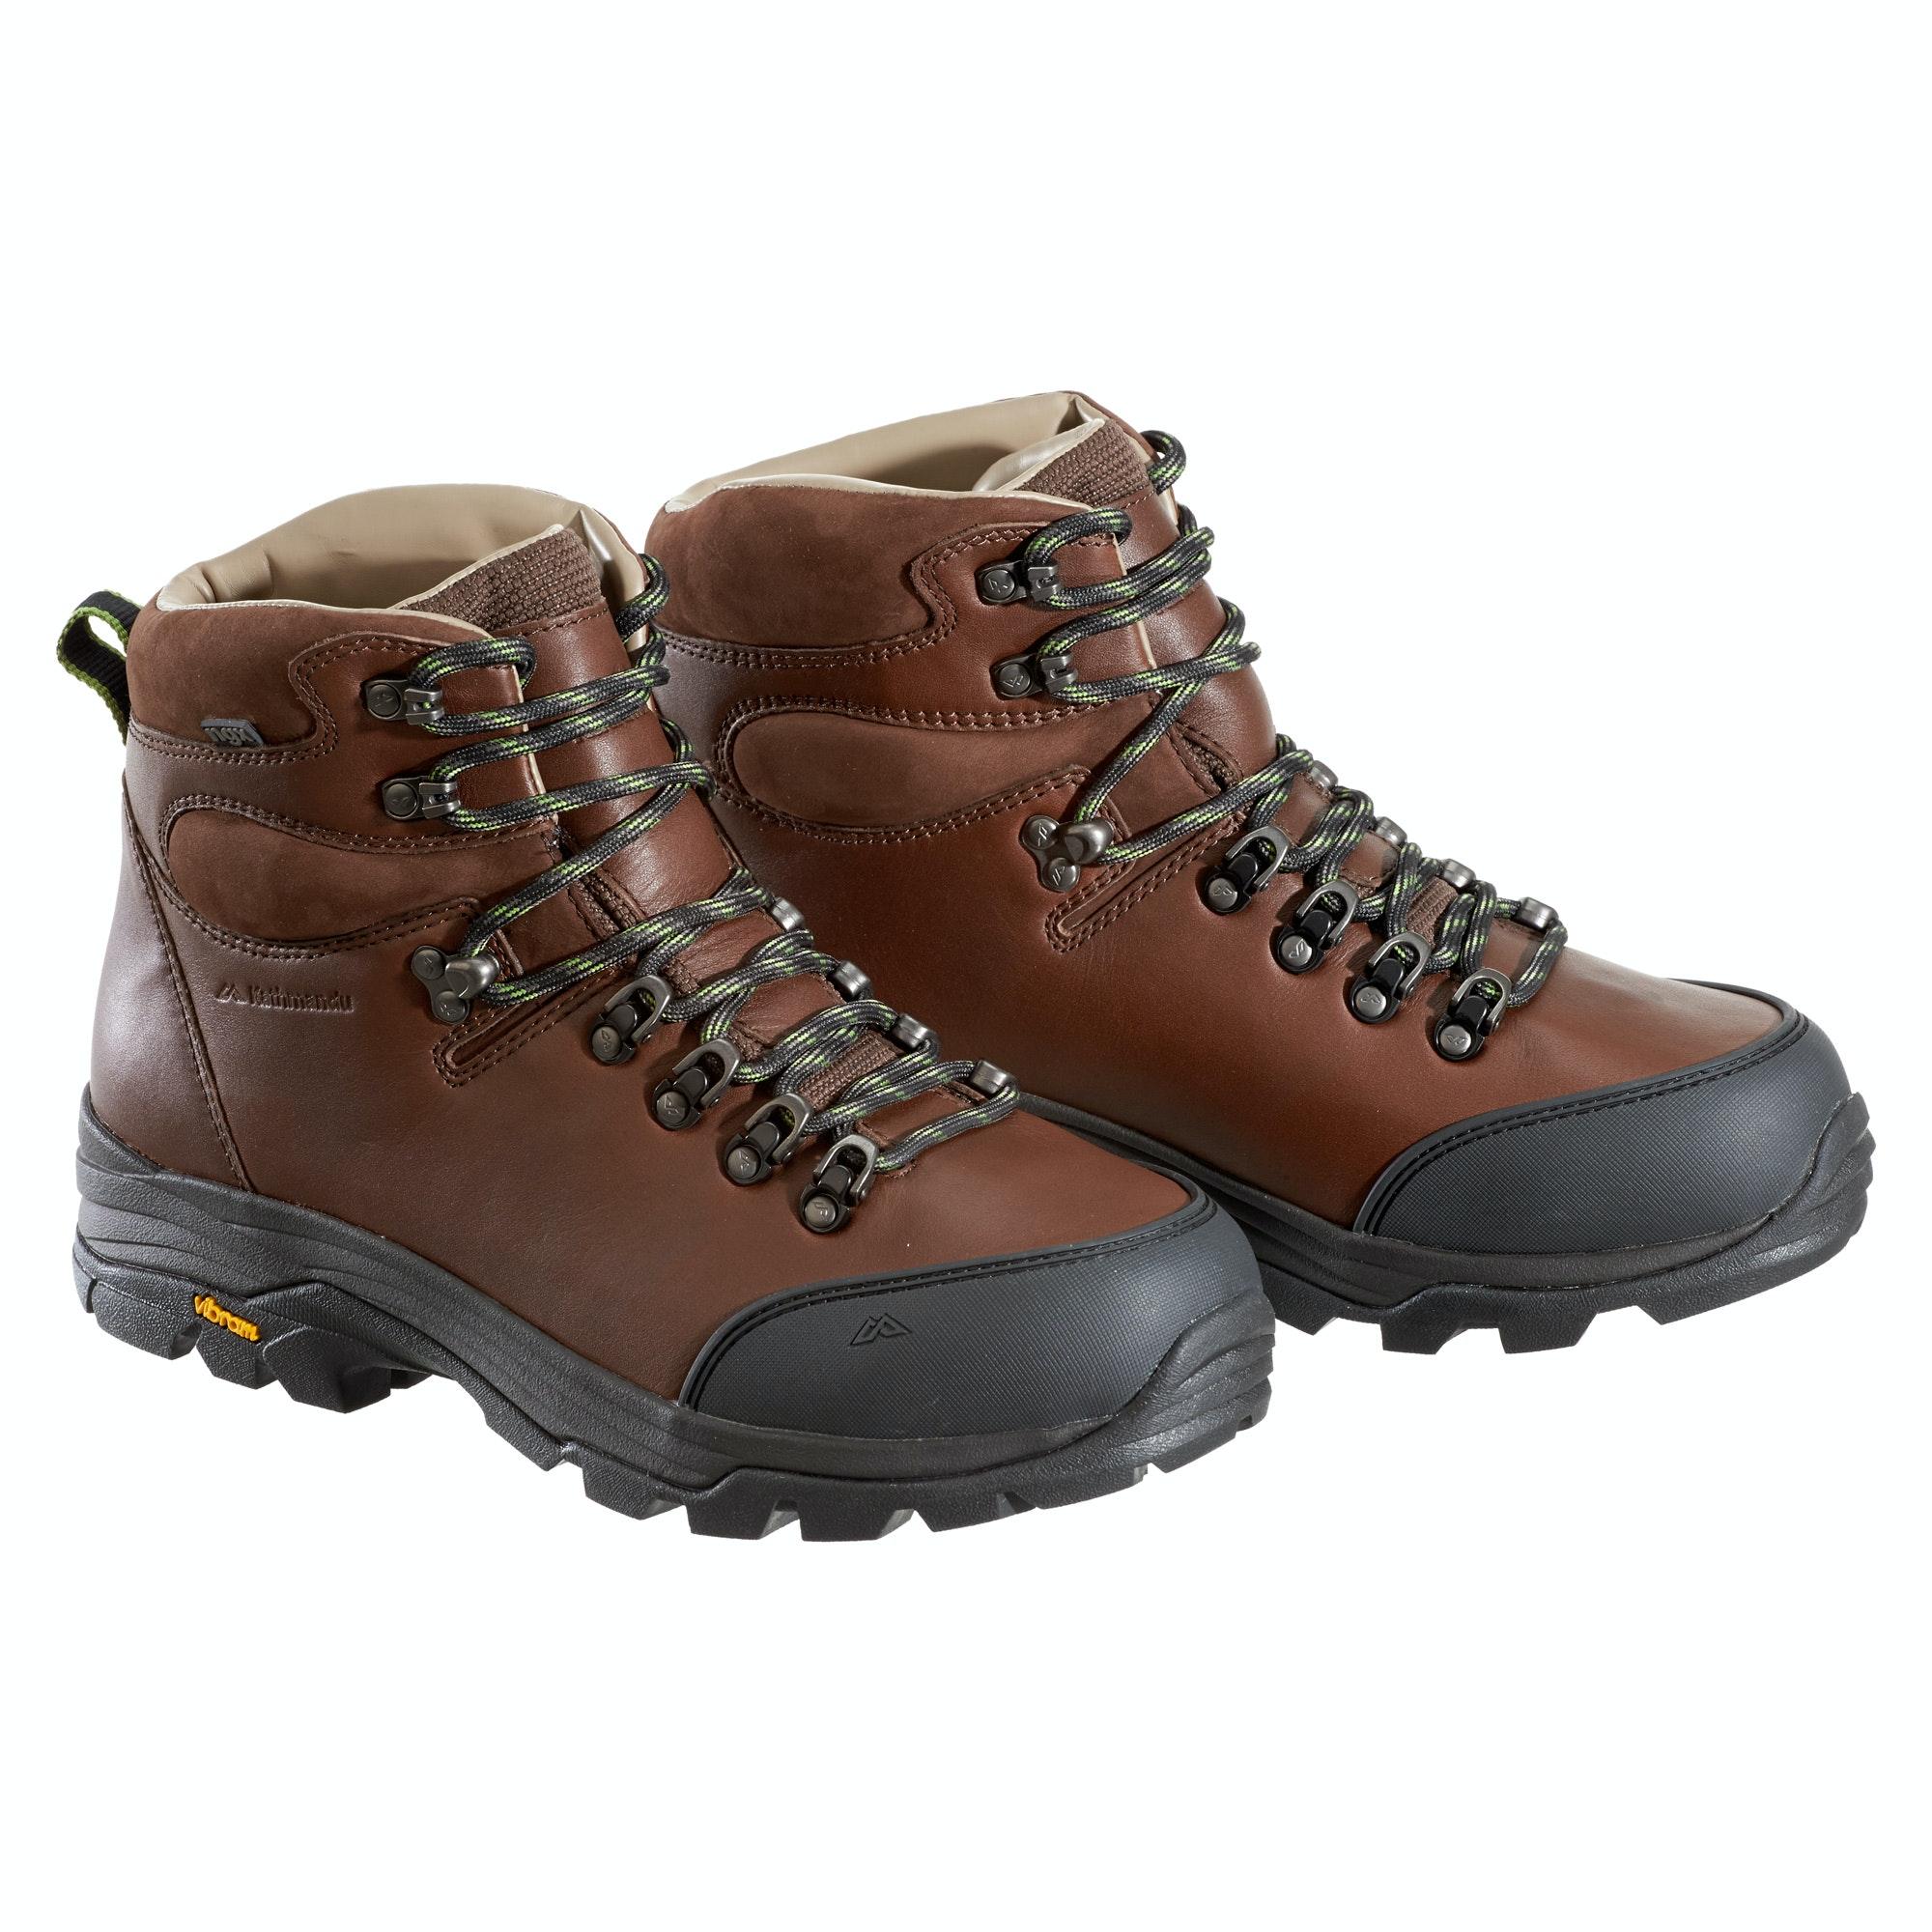 NGX Waterproof Leather Hiking Walking Boots